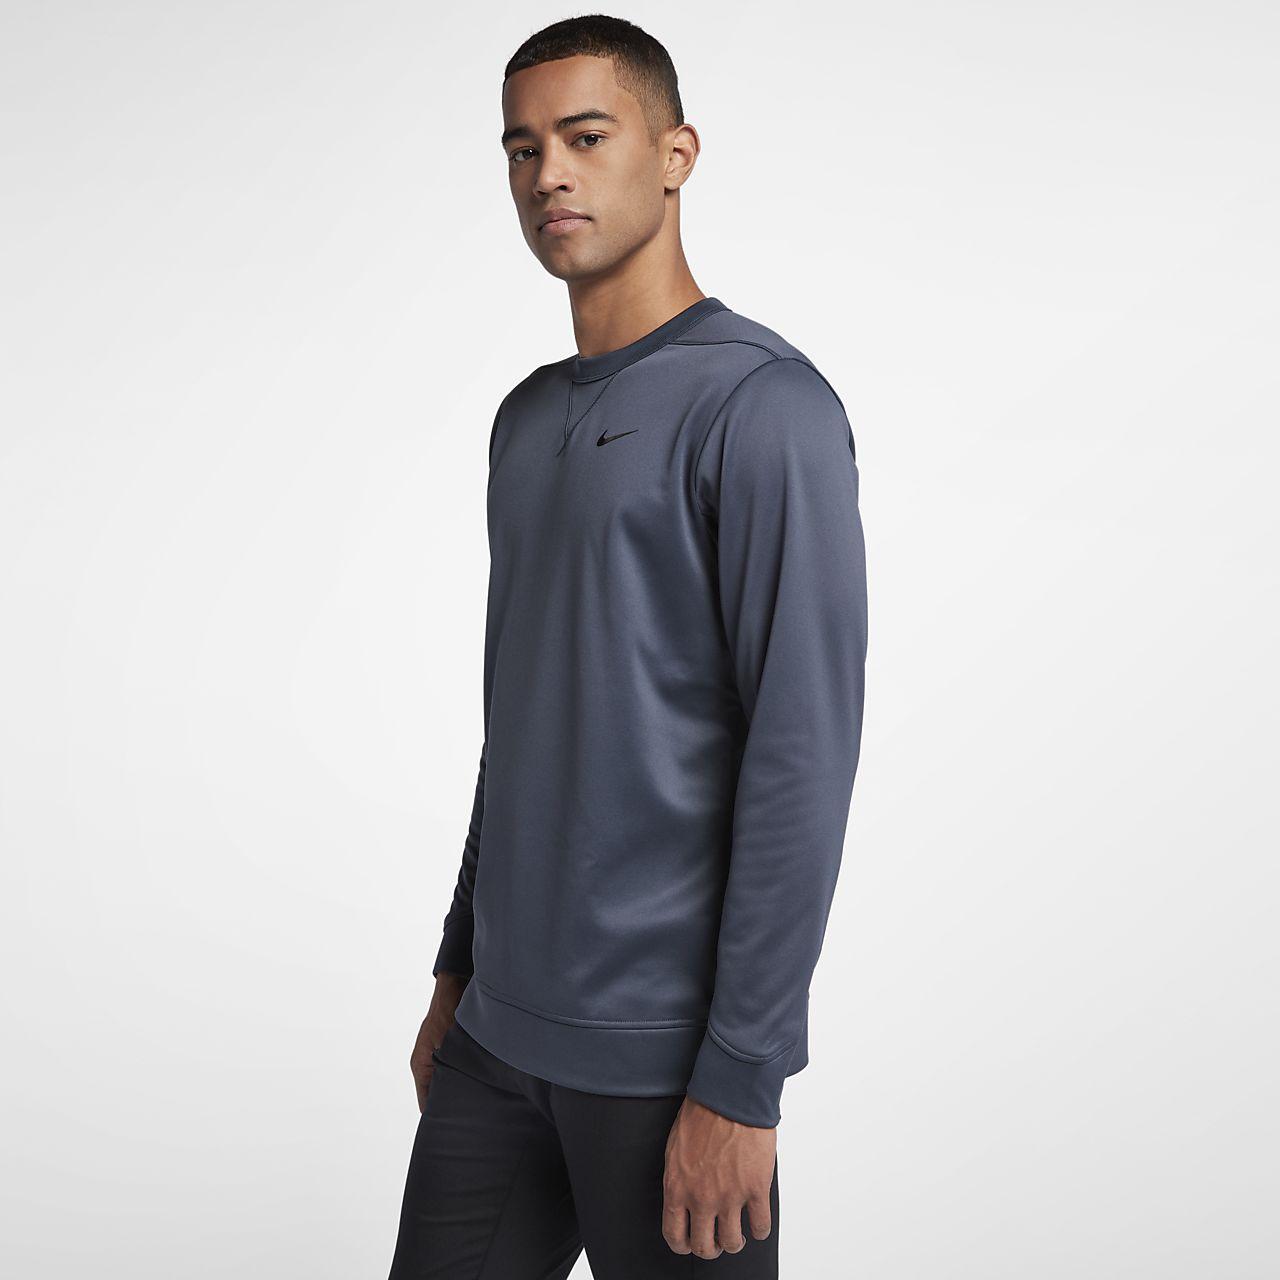 Nike Therma Men's Long-Sleeve Golf Top